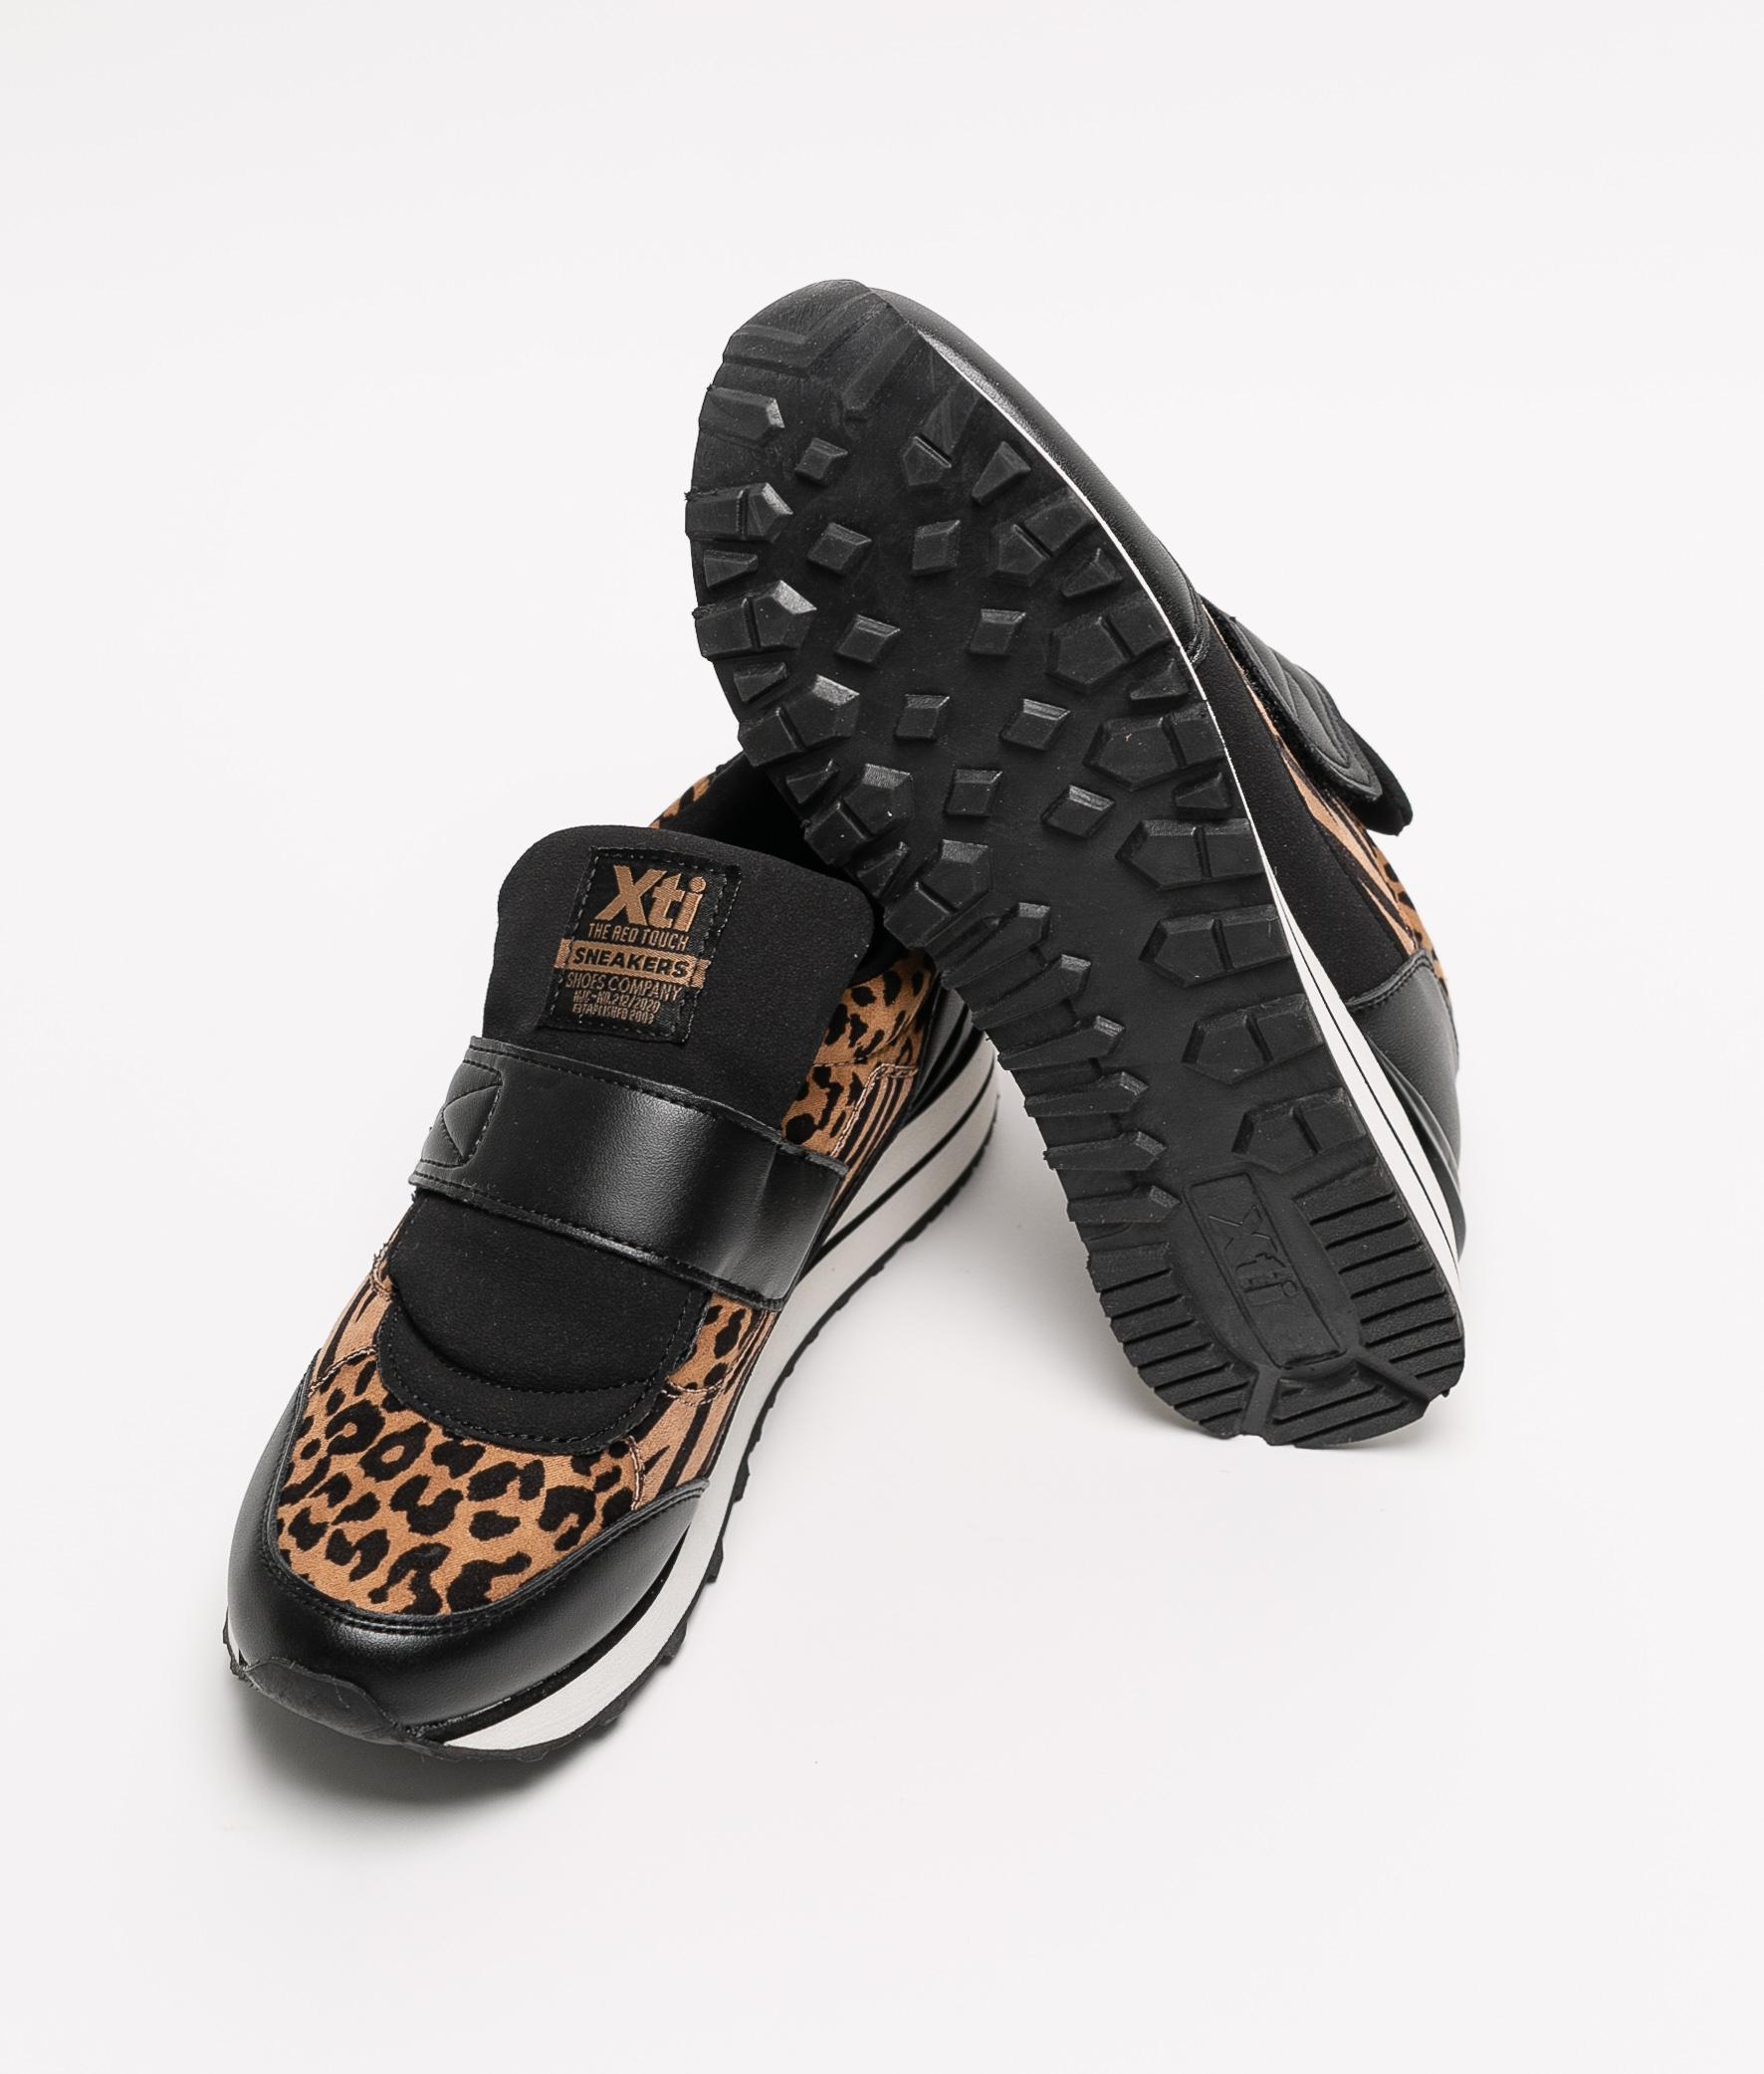 Sneakers Reon Xti - Black